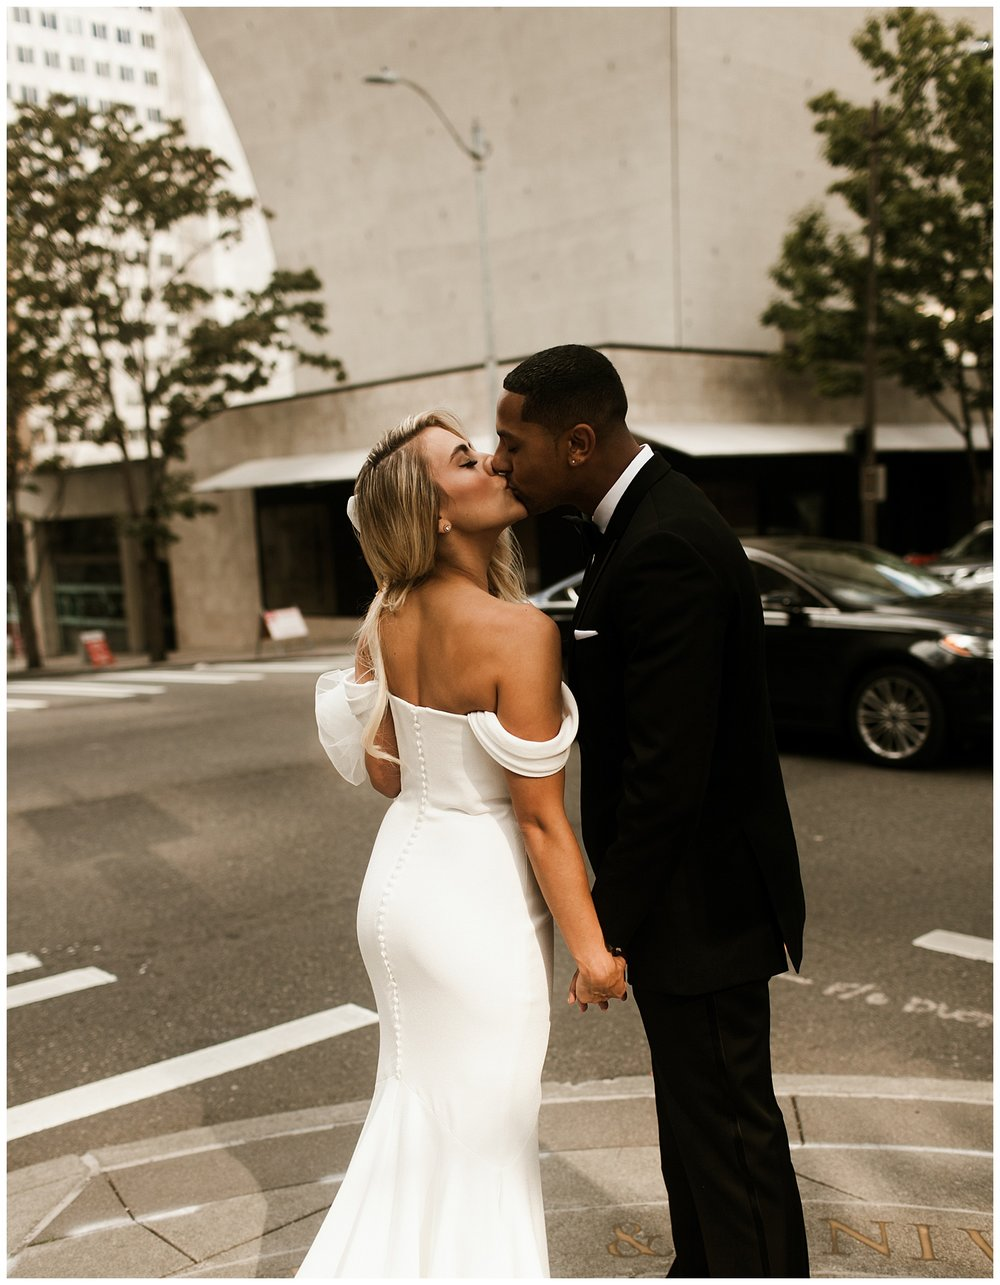 Fairmont Olympic Hotel Wedding_Elizabeth Zuluaga_Taylor & Caton_002.jpg